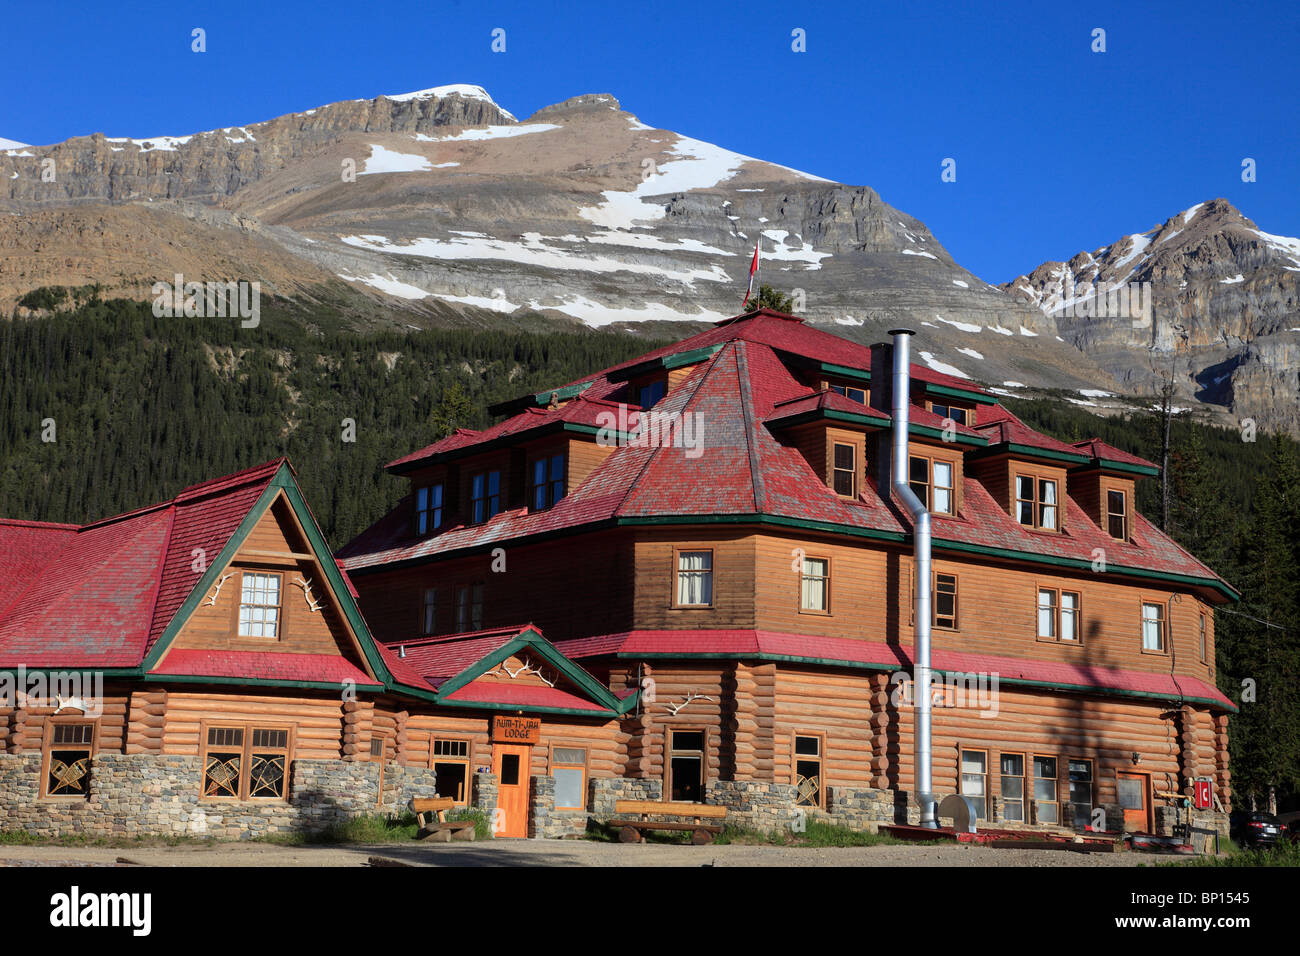 Canada, Alberta, Banff National Park, Num-Ti-Jah Lodge, Mount Jimmy Simpson - Stock Image